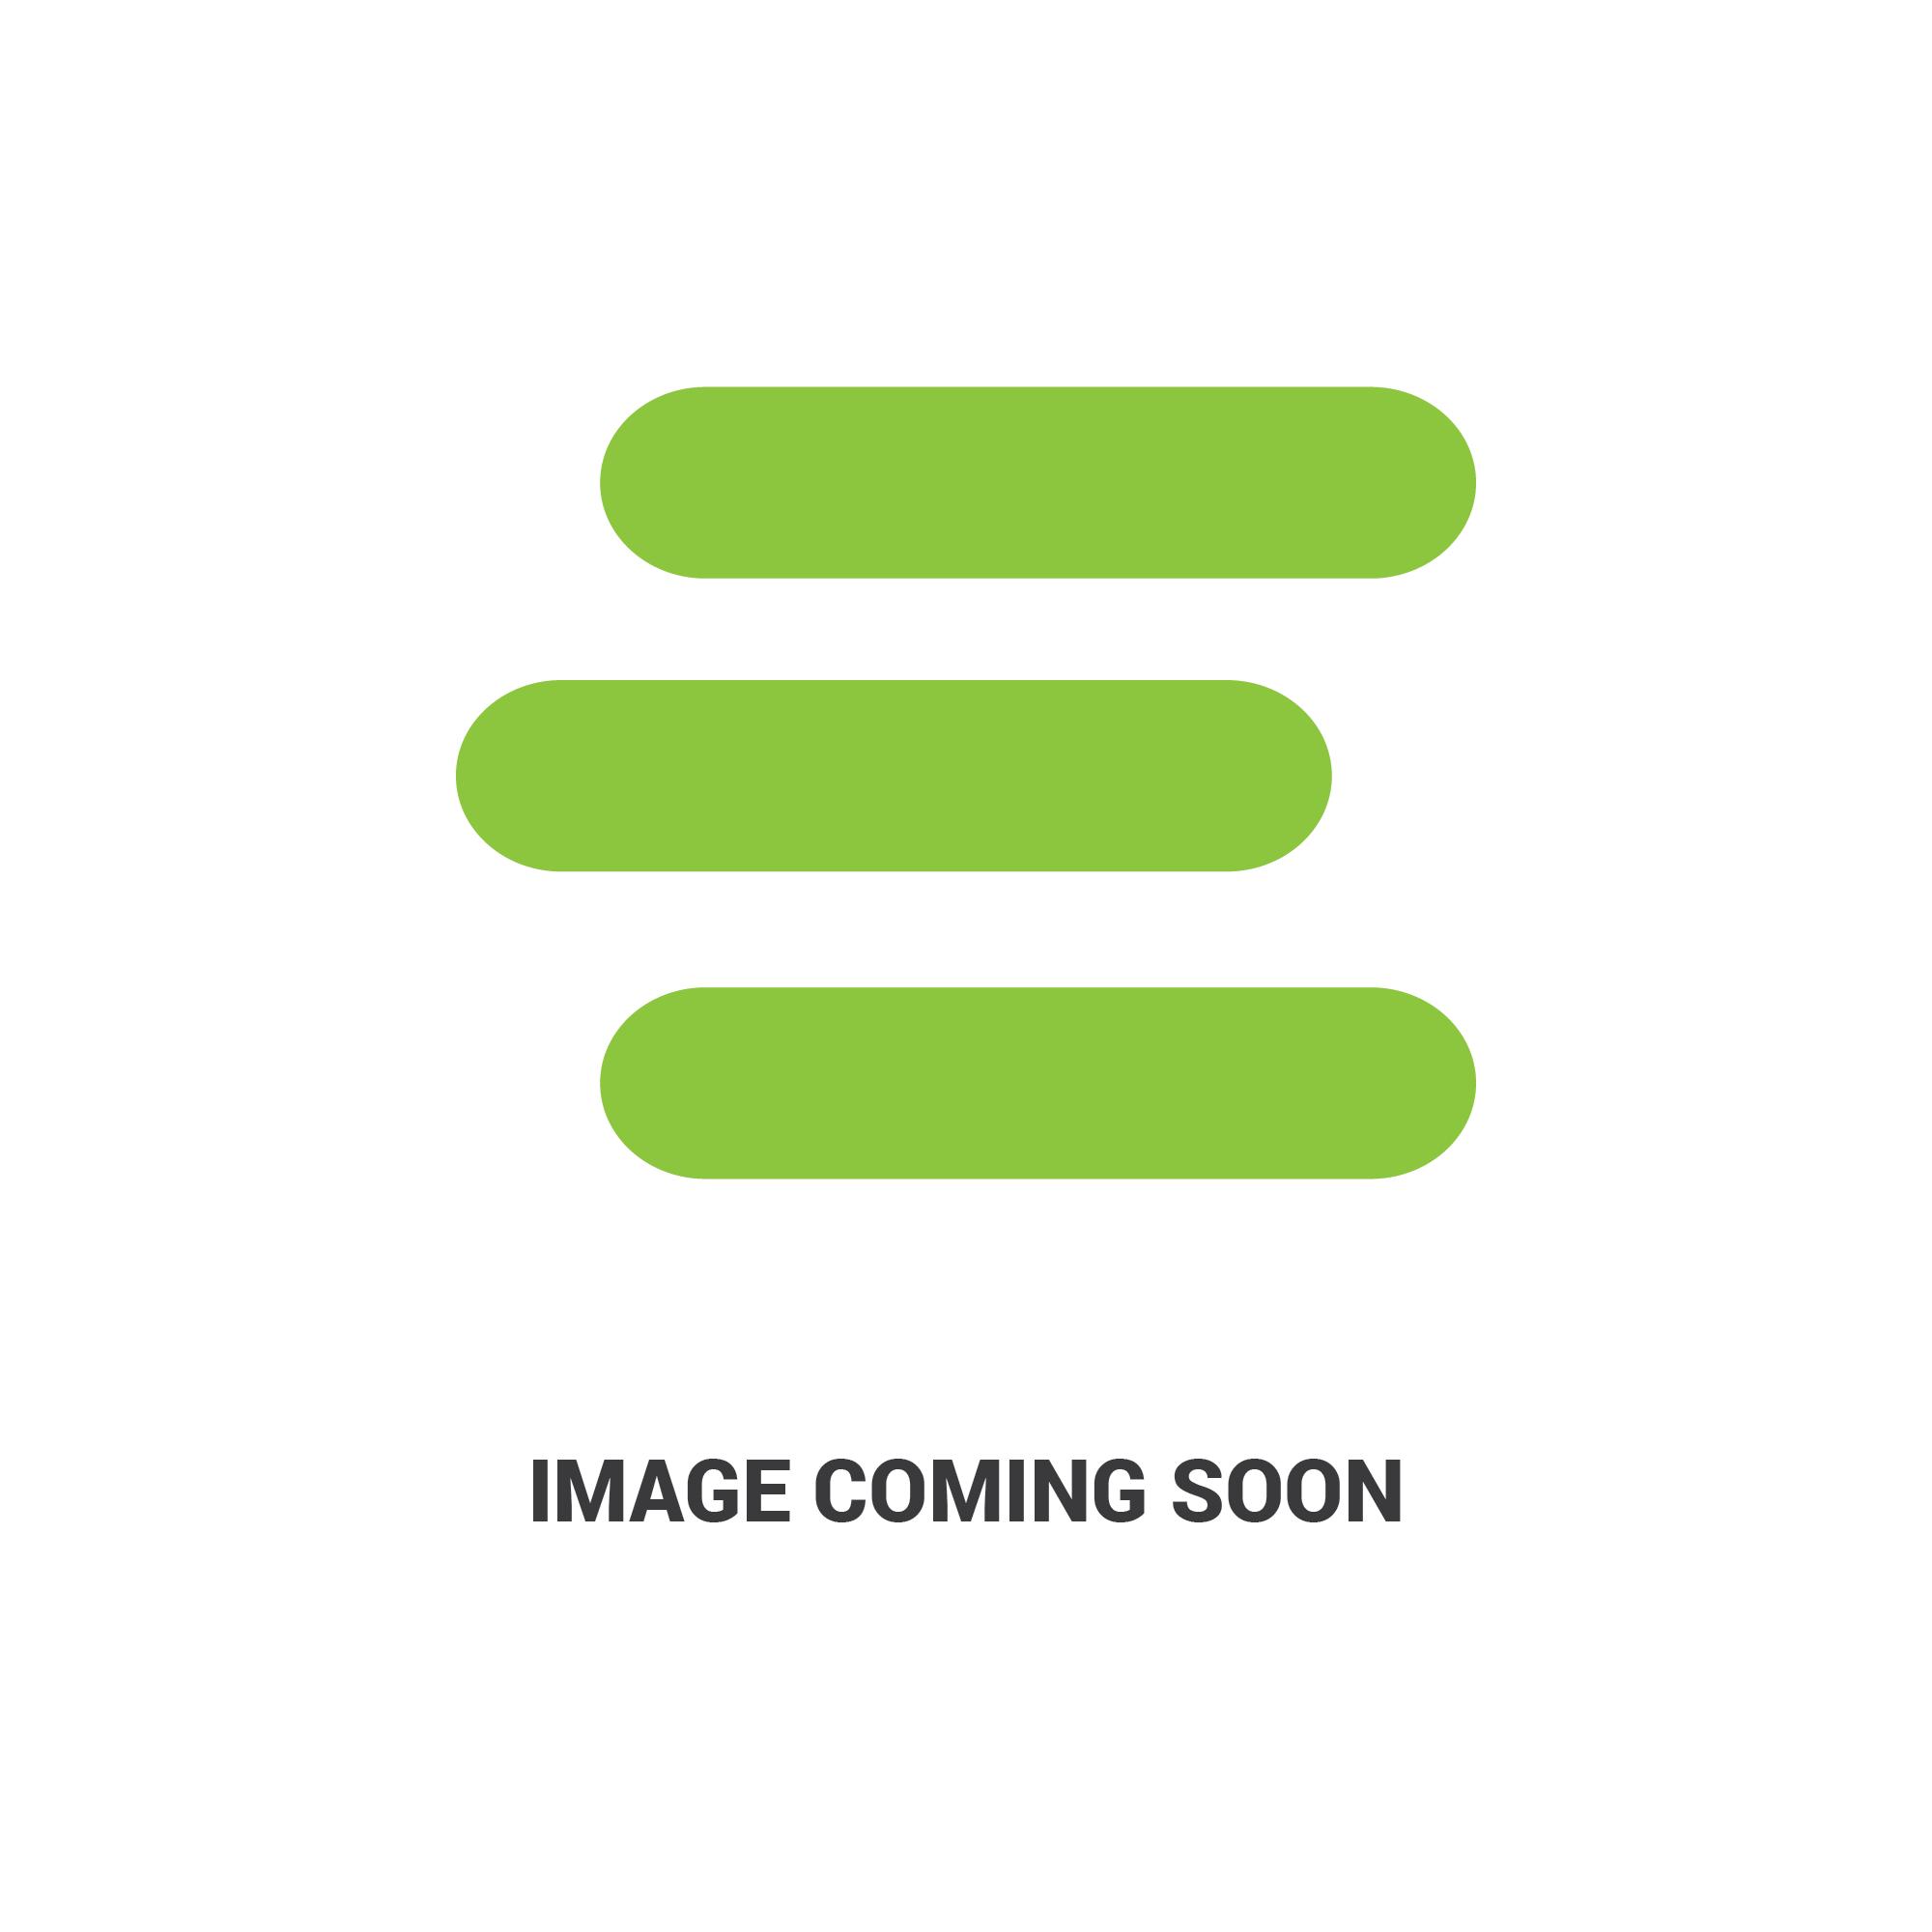 E-853820edit 3.jpg